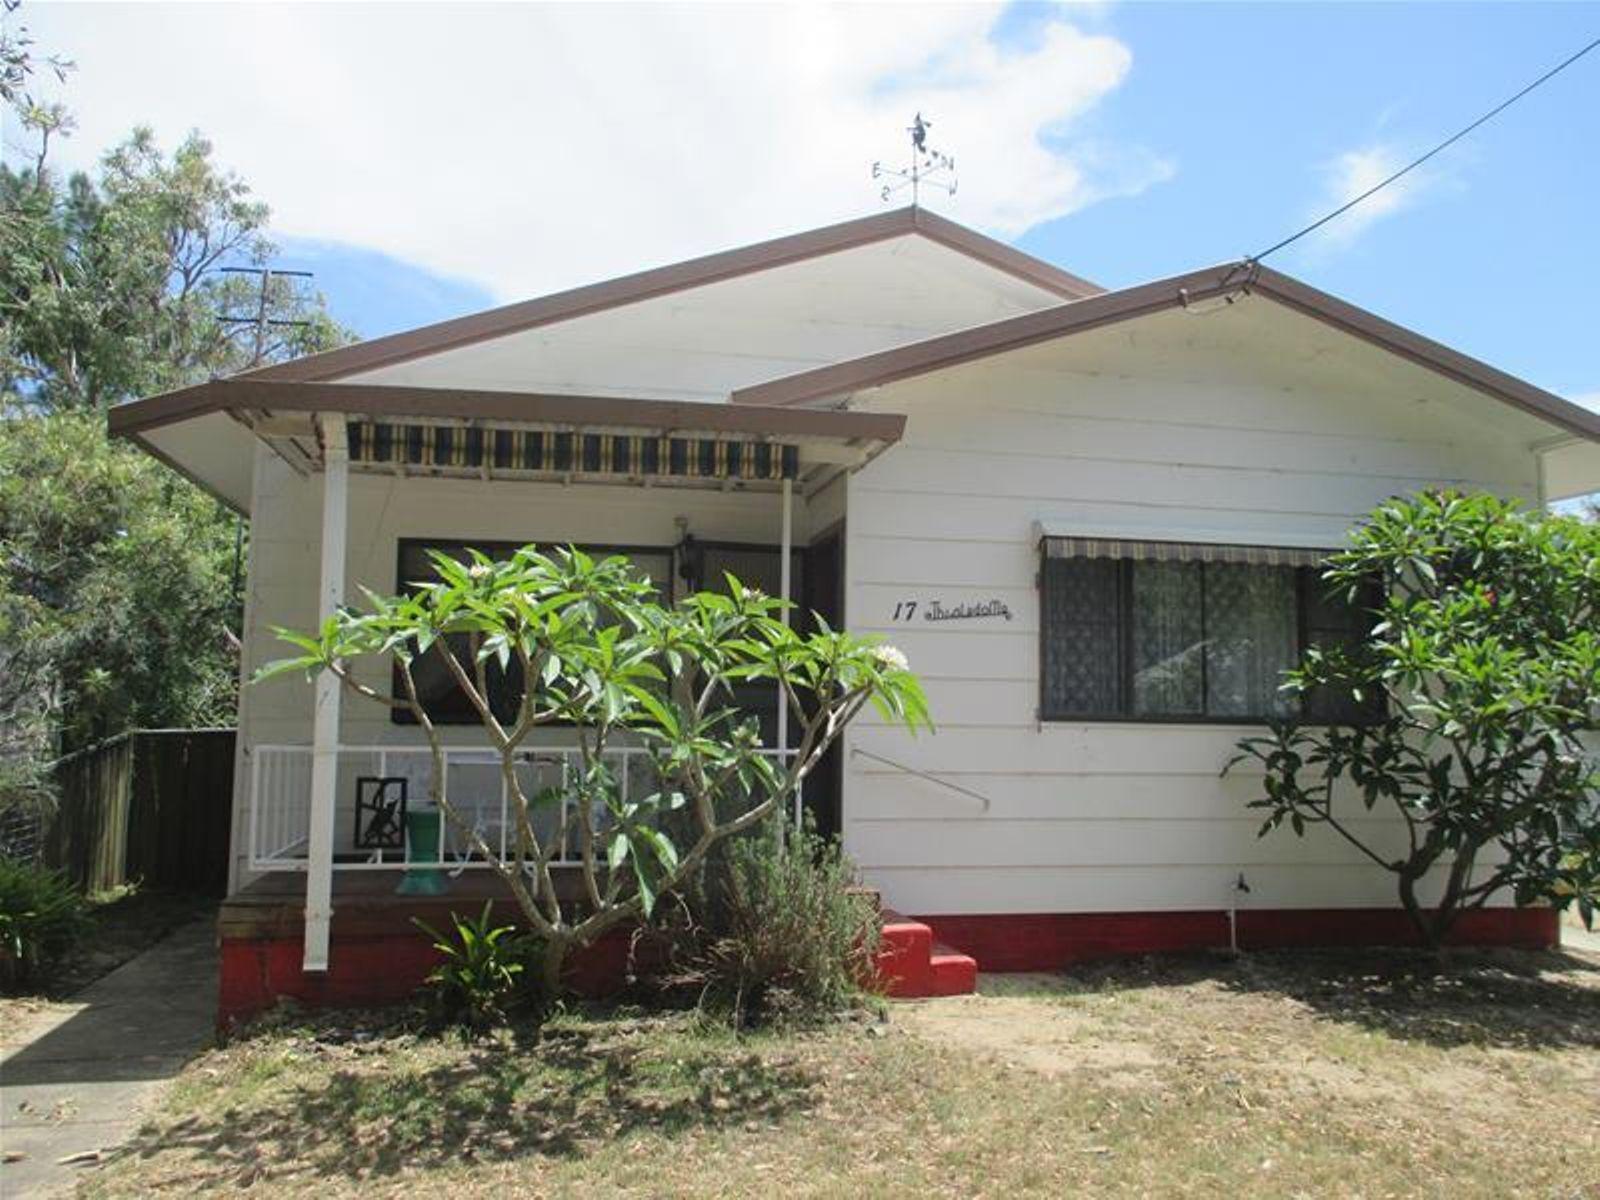 17 Jacaranda Avenue, Patonga, NSW 2256